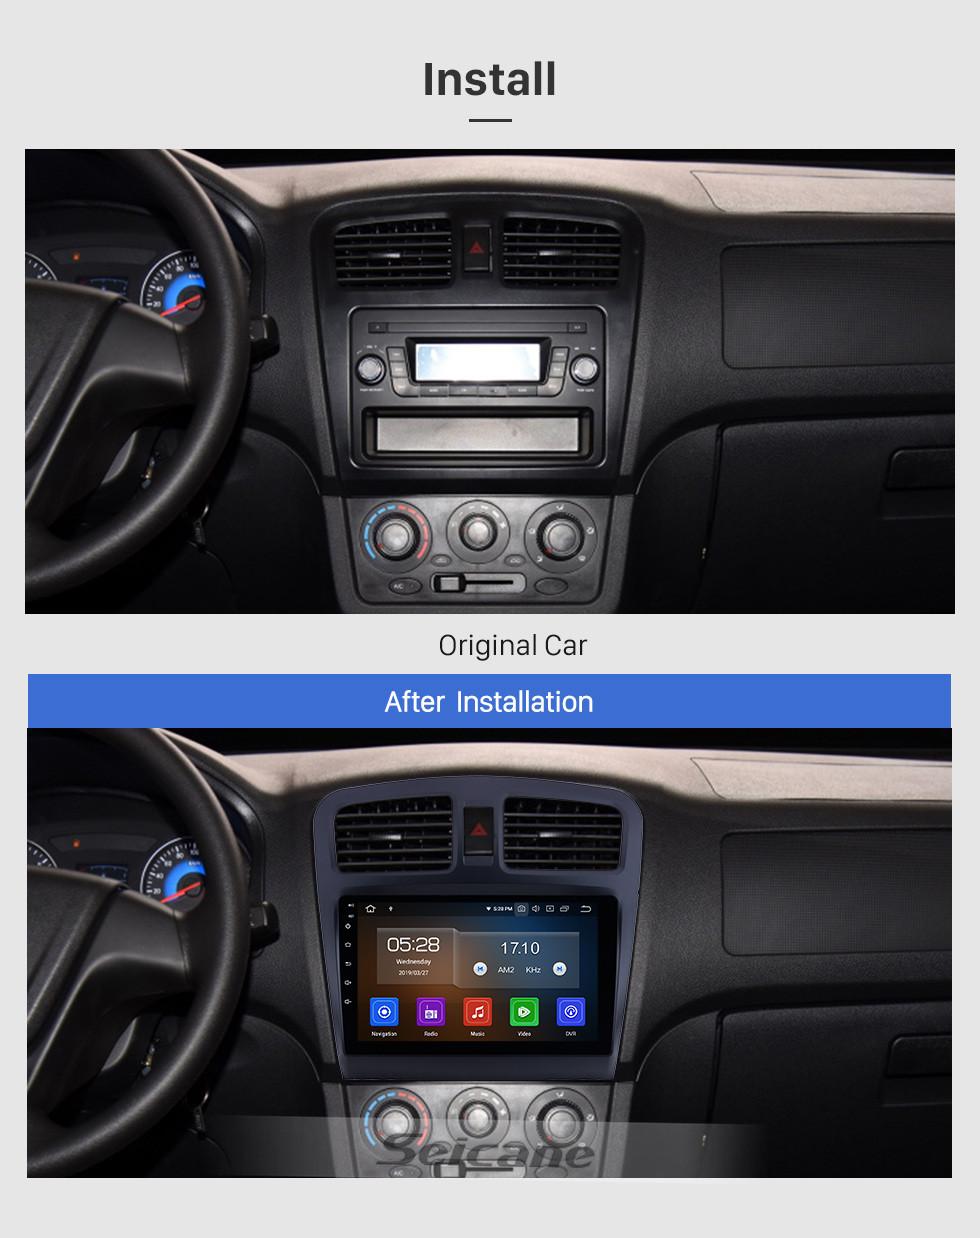 Seicane Android 10.0 para 2014 Fengon 330 Radio 9 pulgadas Navegación GPS Bluetooth WIFI HD Pantalla táctil USB Carplay soporte DVR SWC 1080P Video